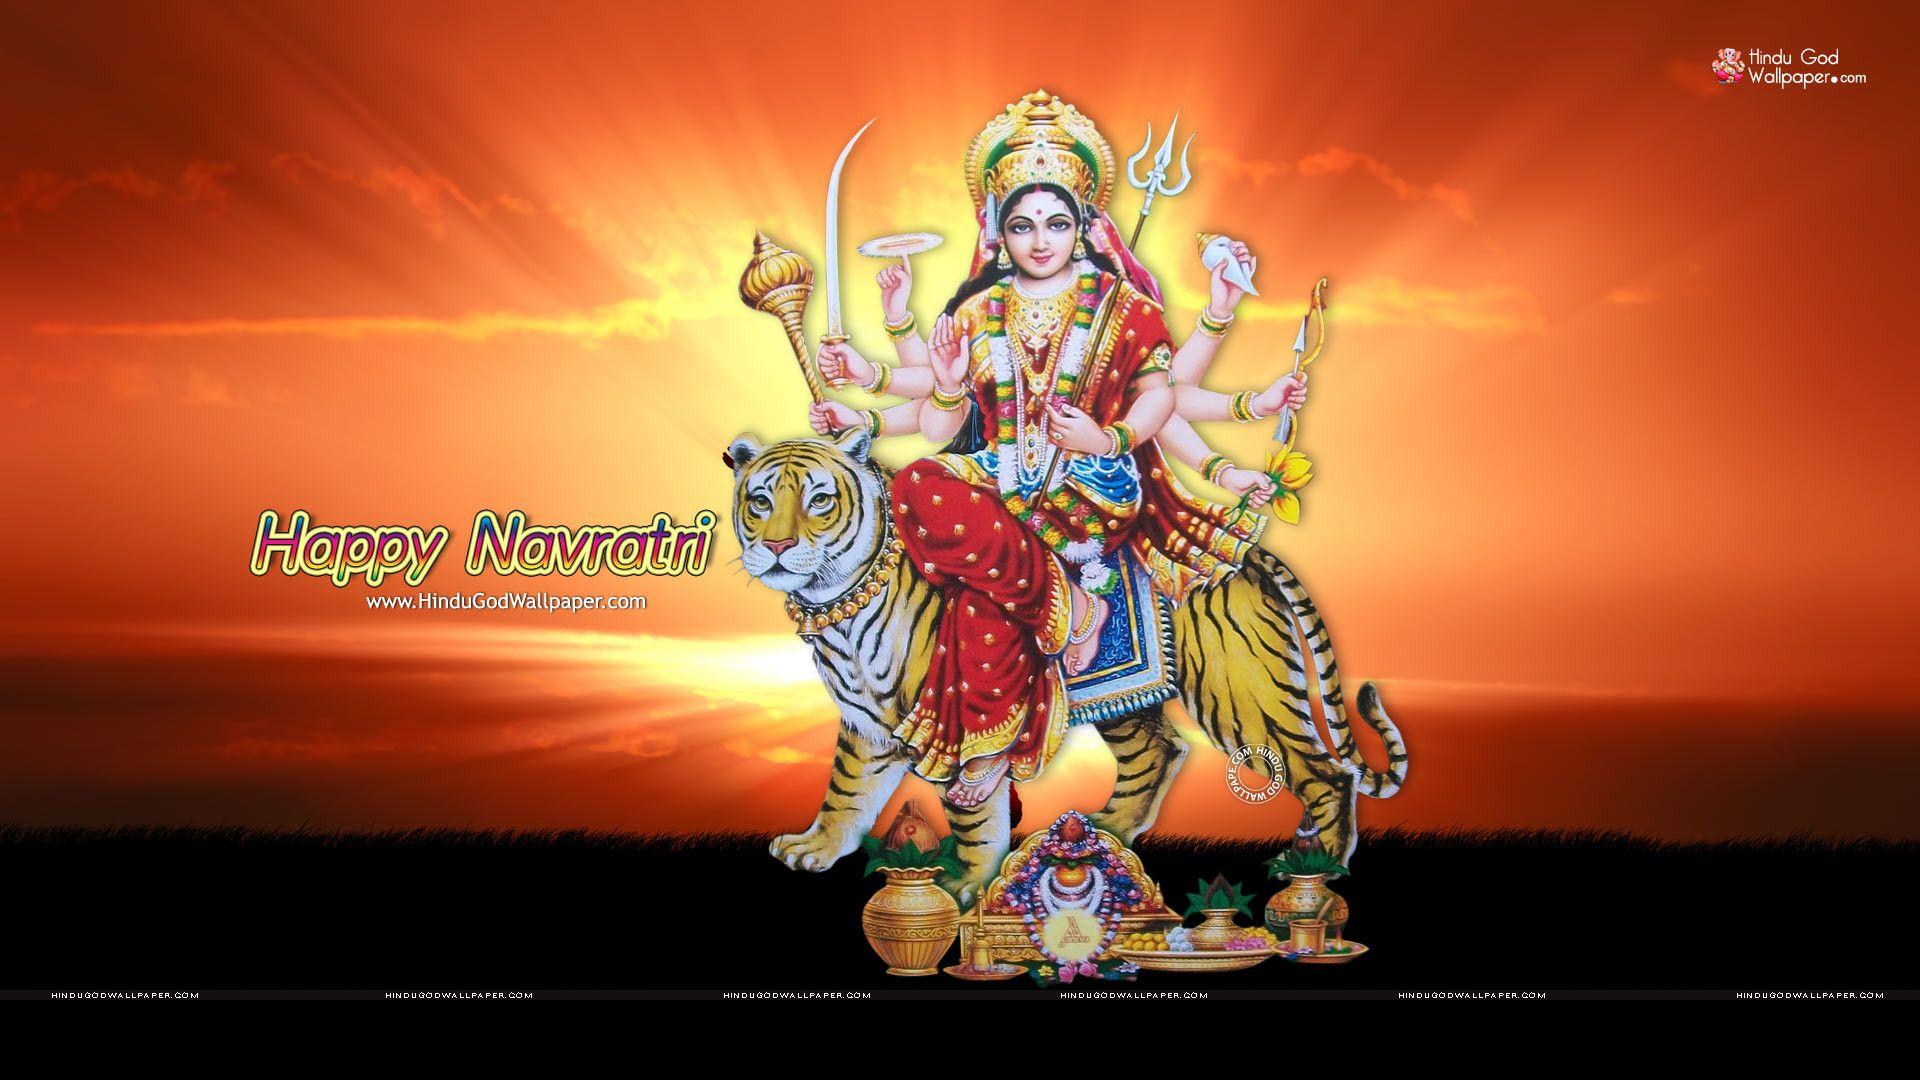 1920x1080 Navratri Hd Wallpaper 1080p Hd Wallpapers 1080p Happy